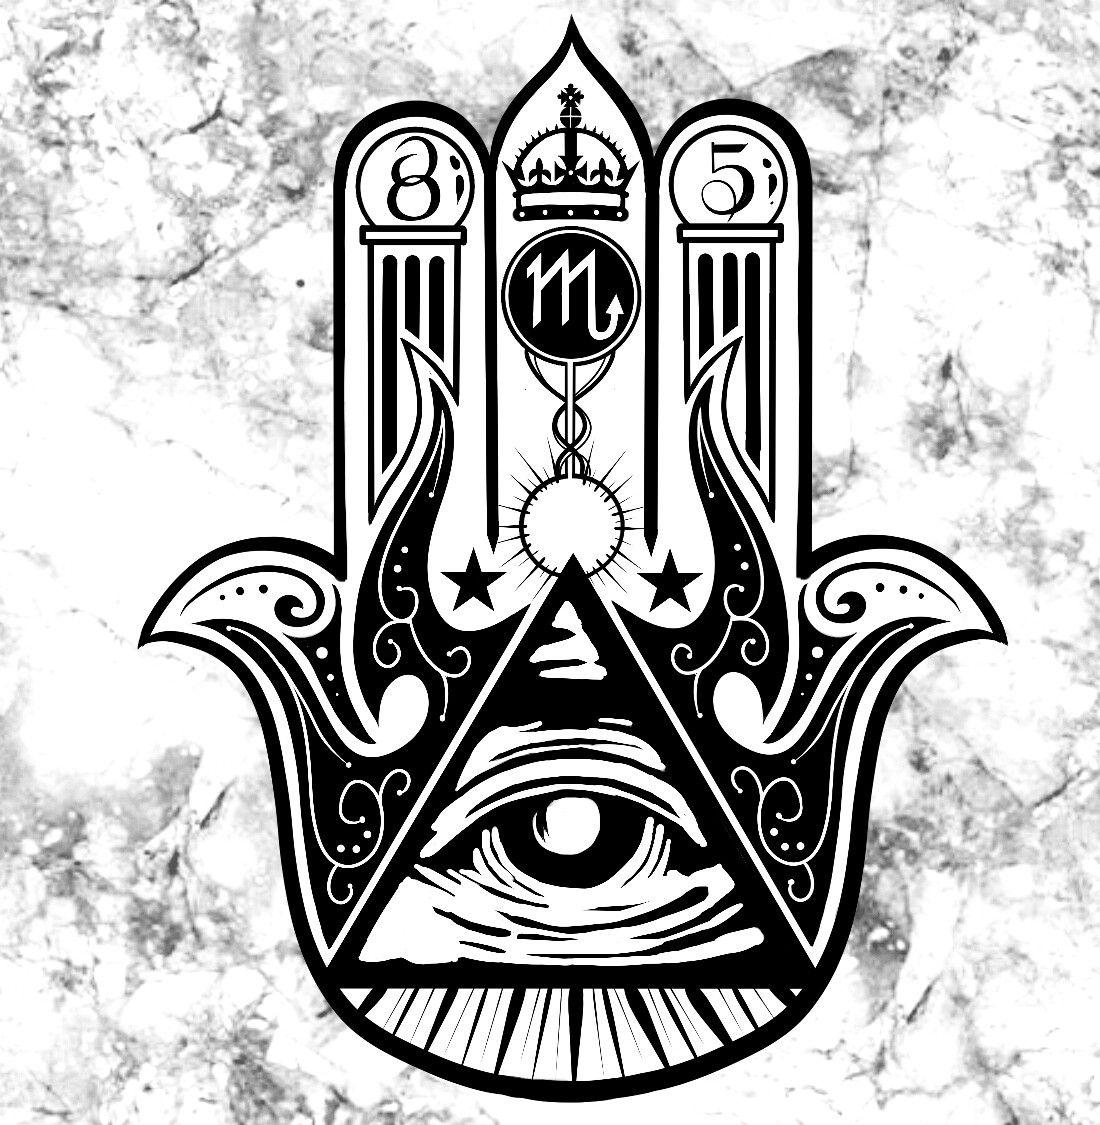 Pin By Taylor Hovis On Tats With Images Illuminati Symbols